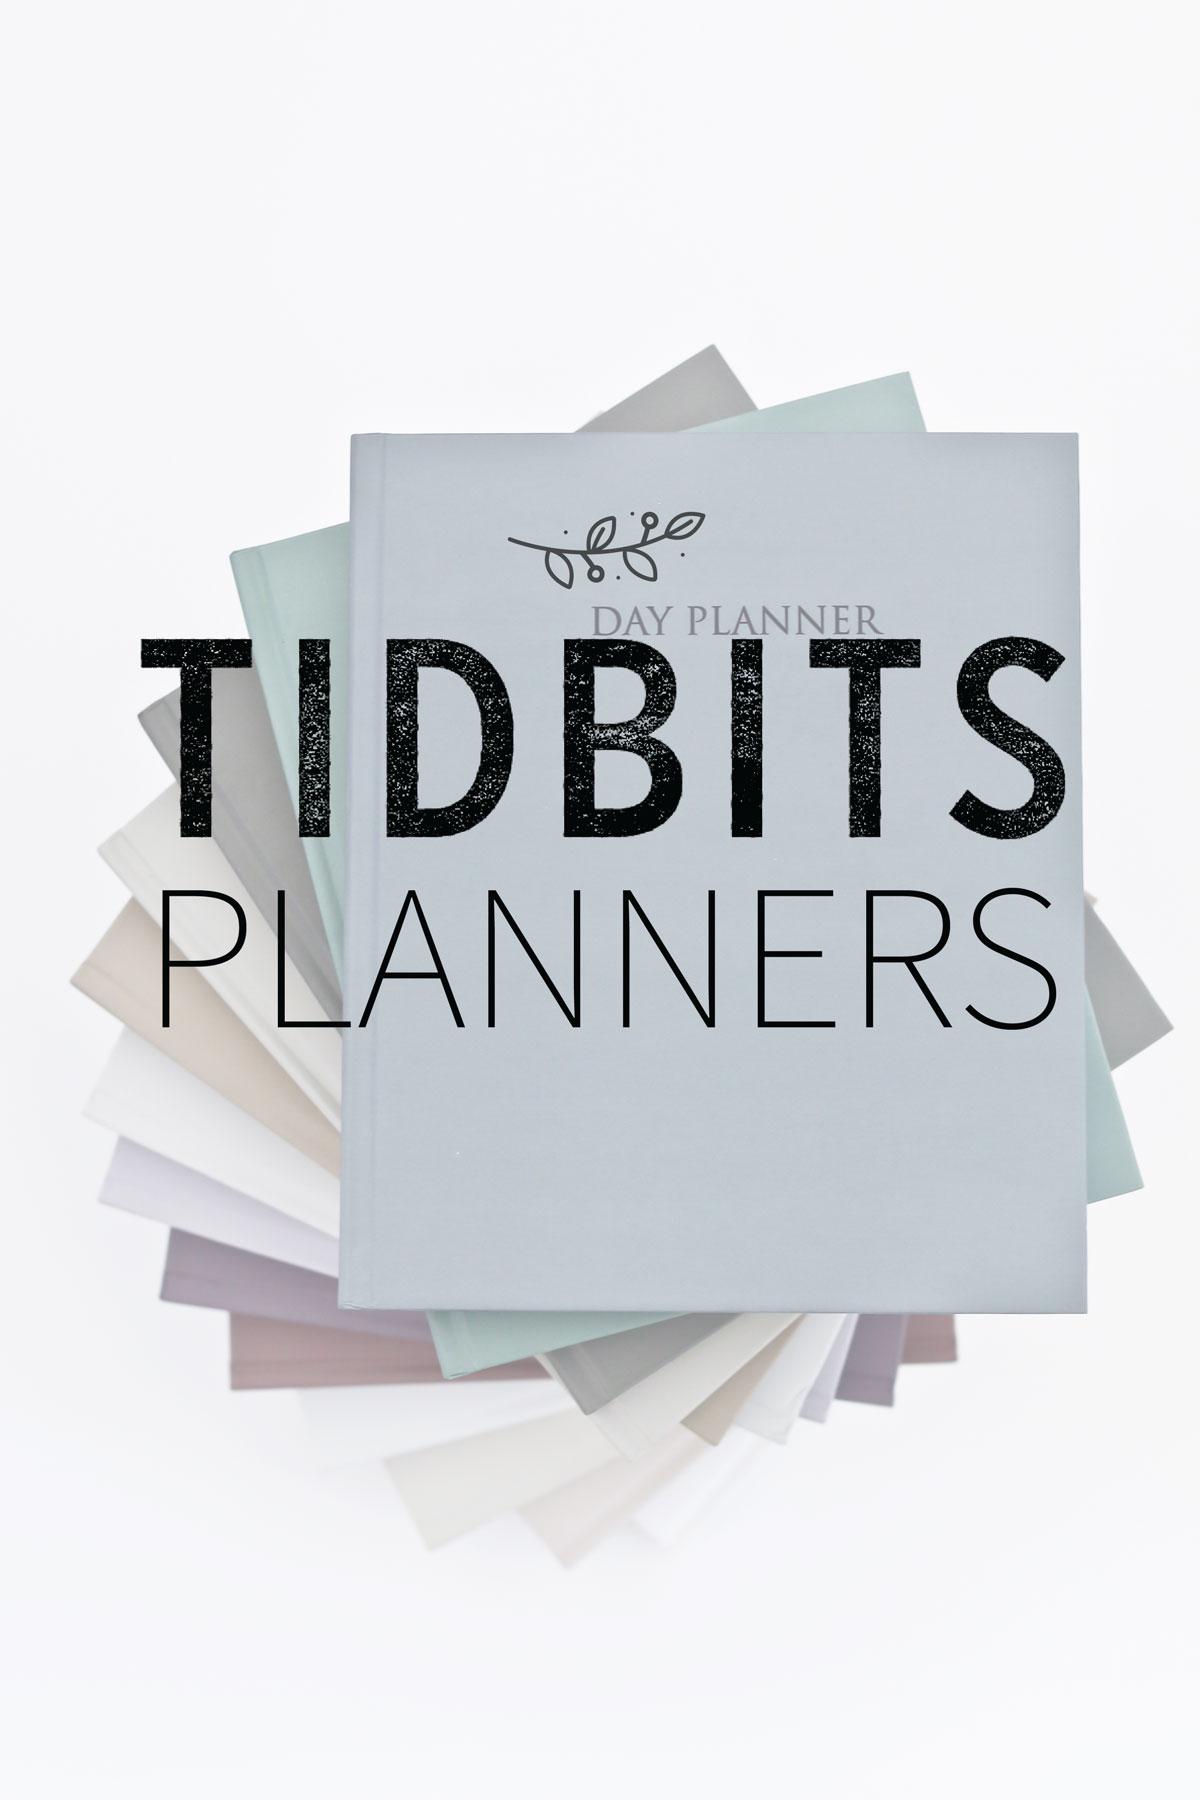 TIDBITS Planners